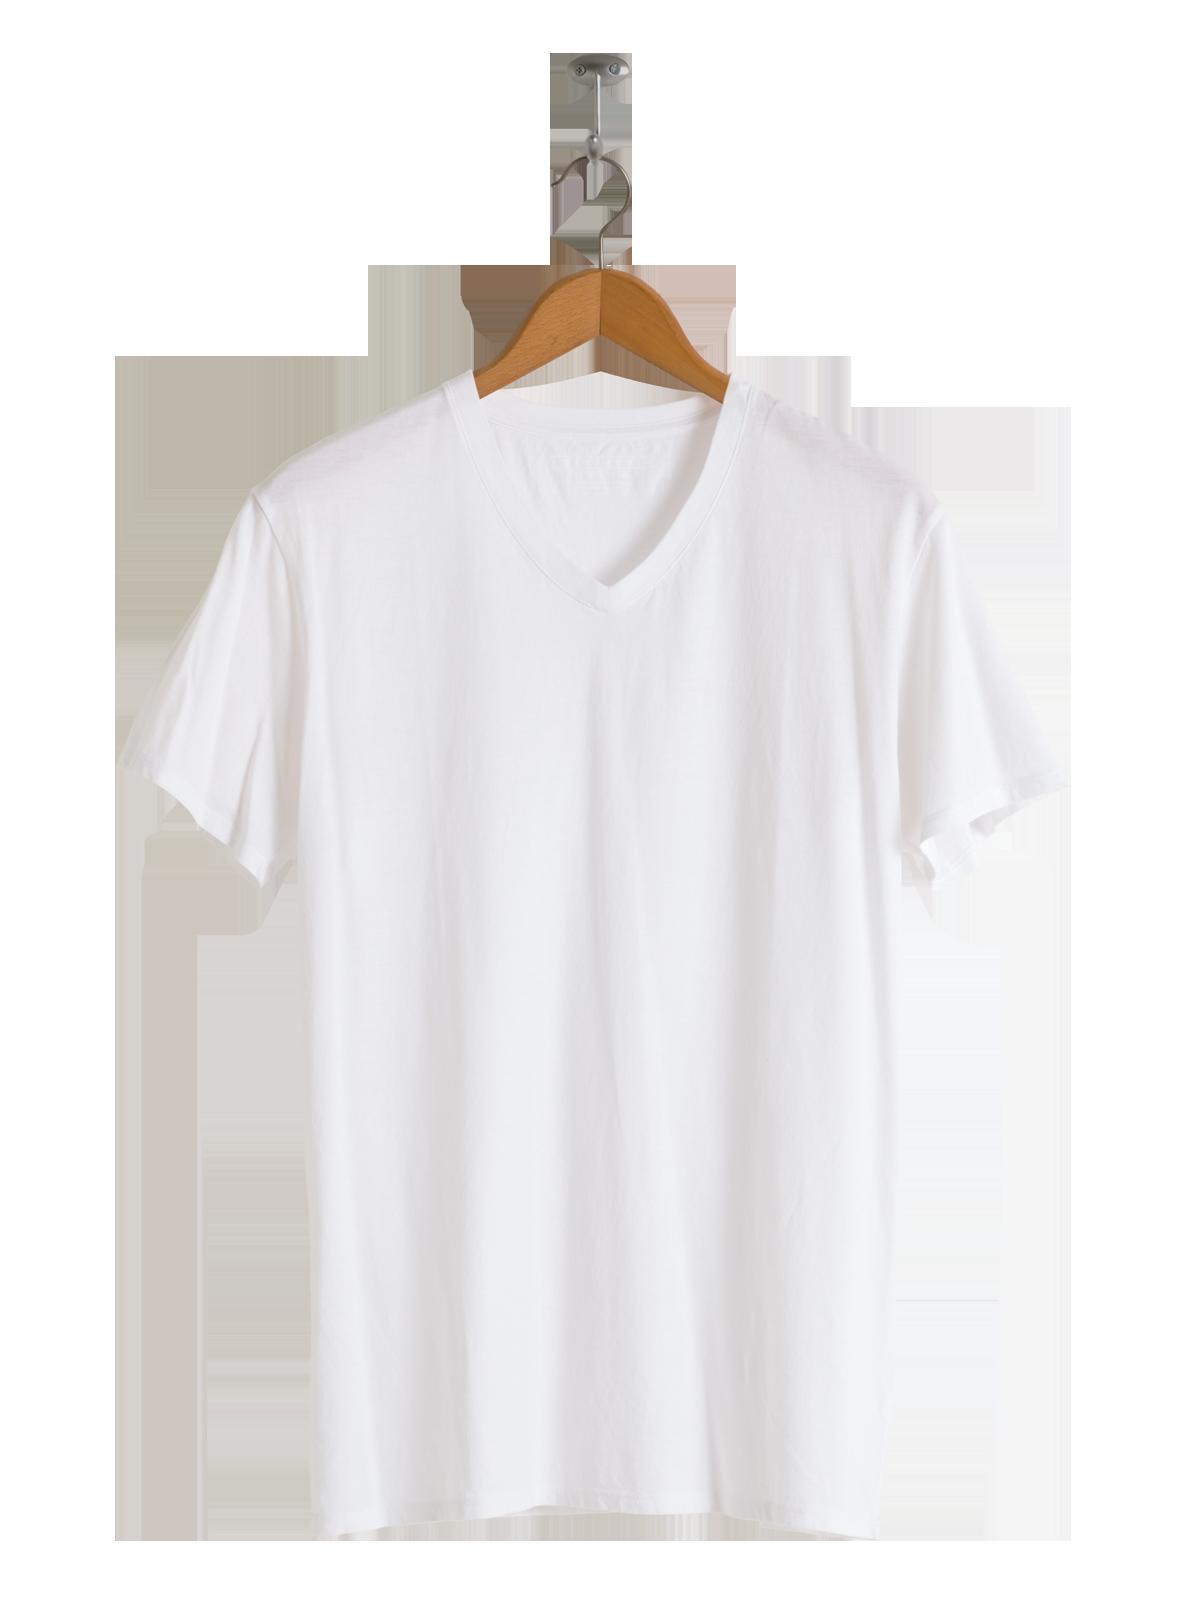 T shirt white png - Neushop Men Morris Tshirt White